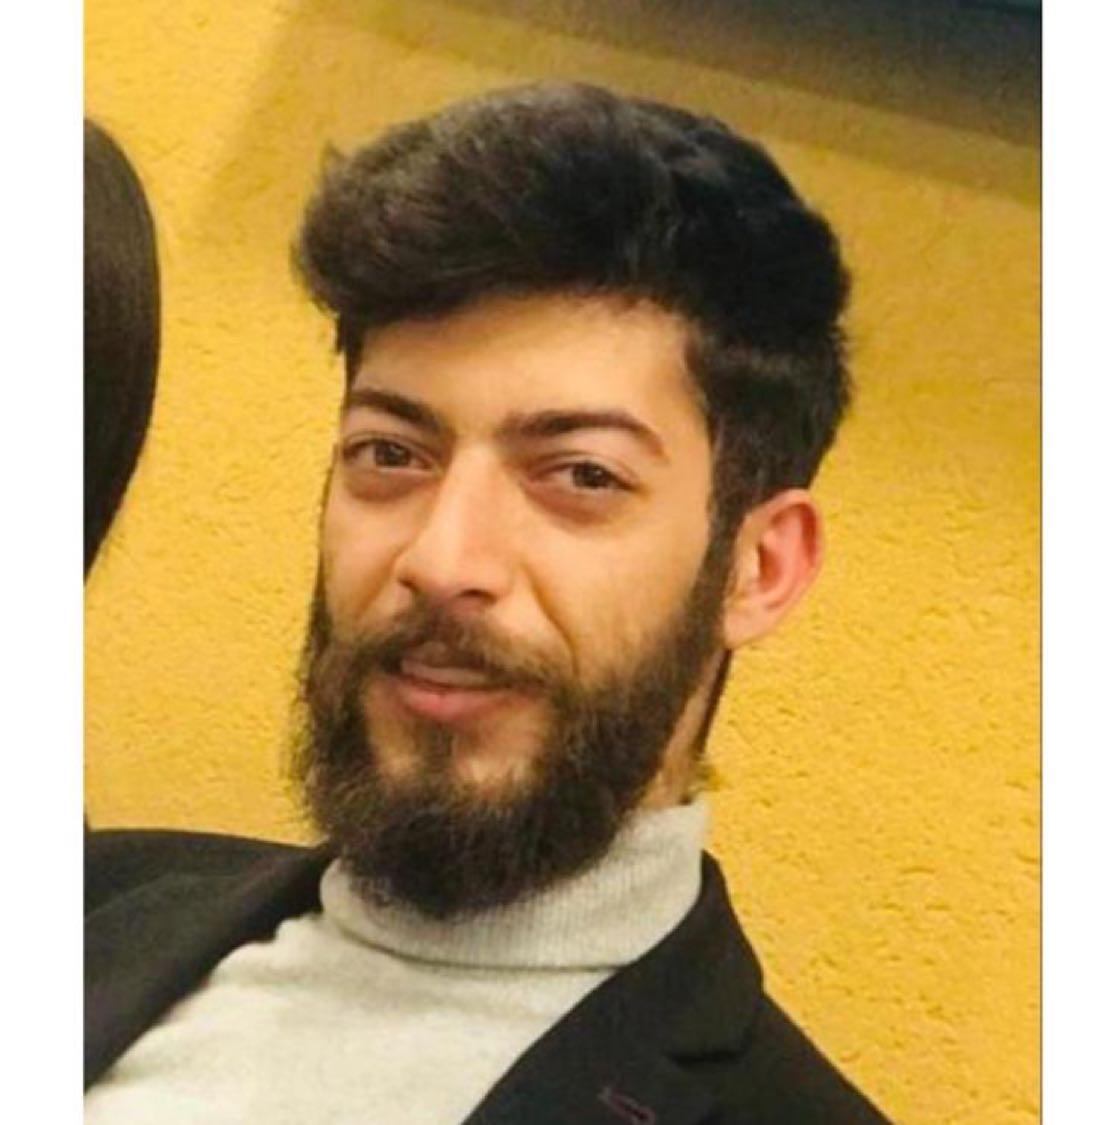 Omar El Jirbi